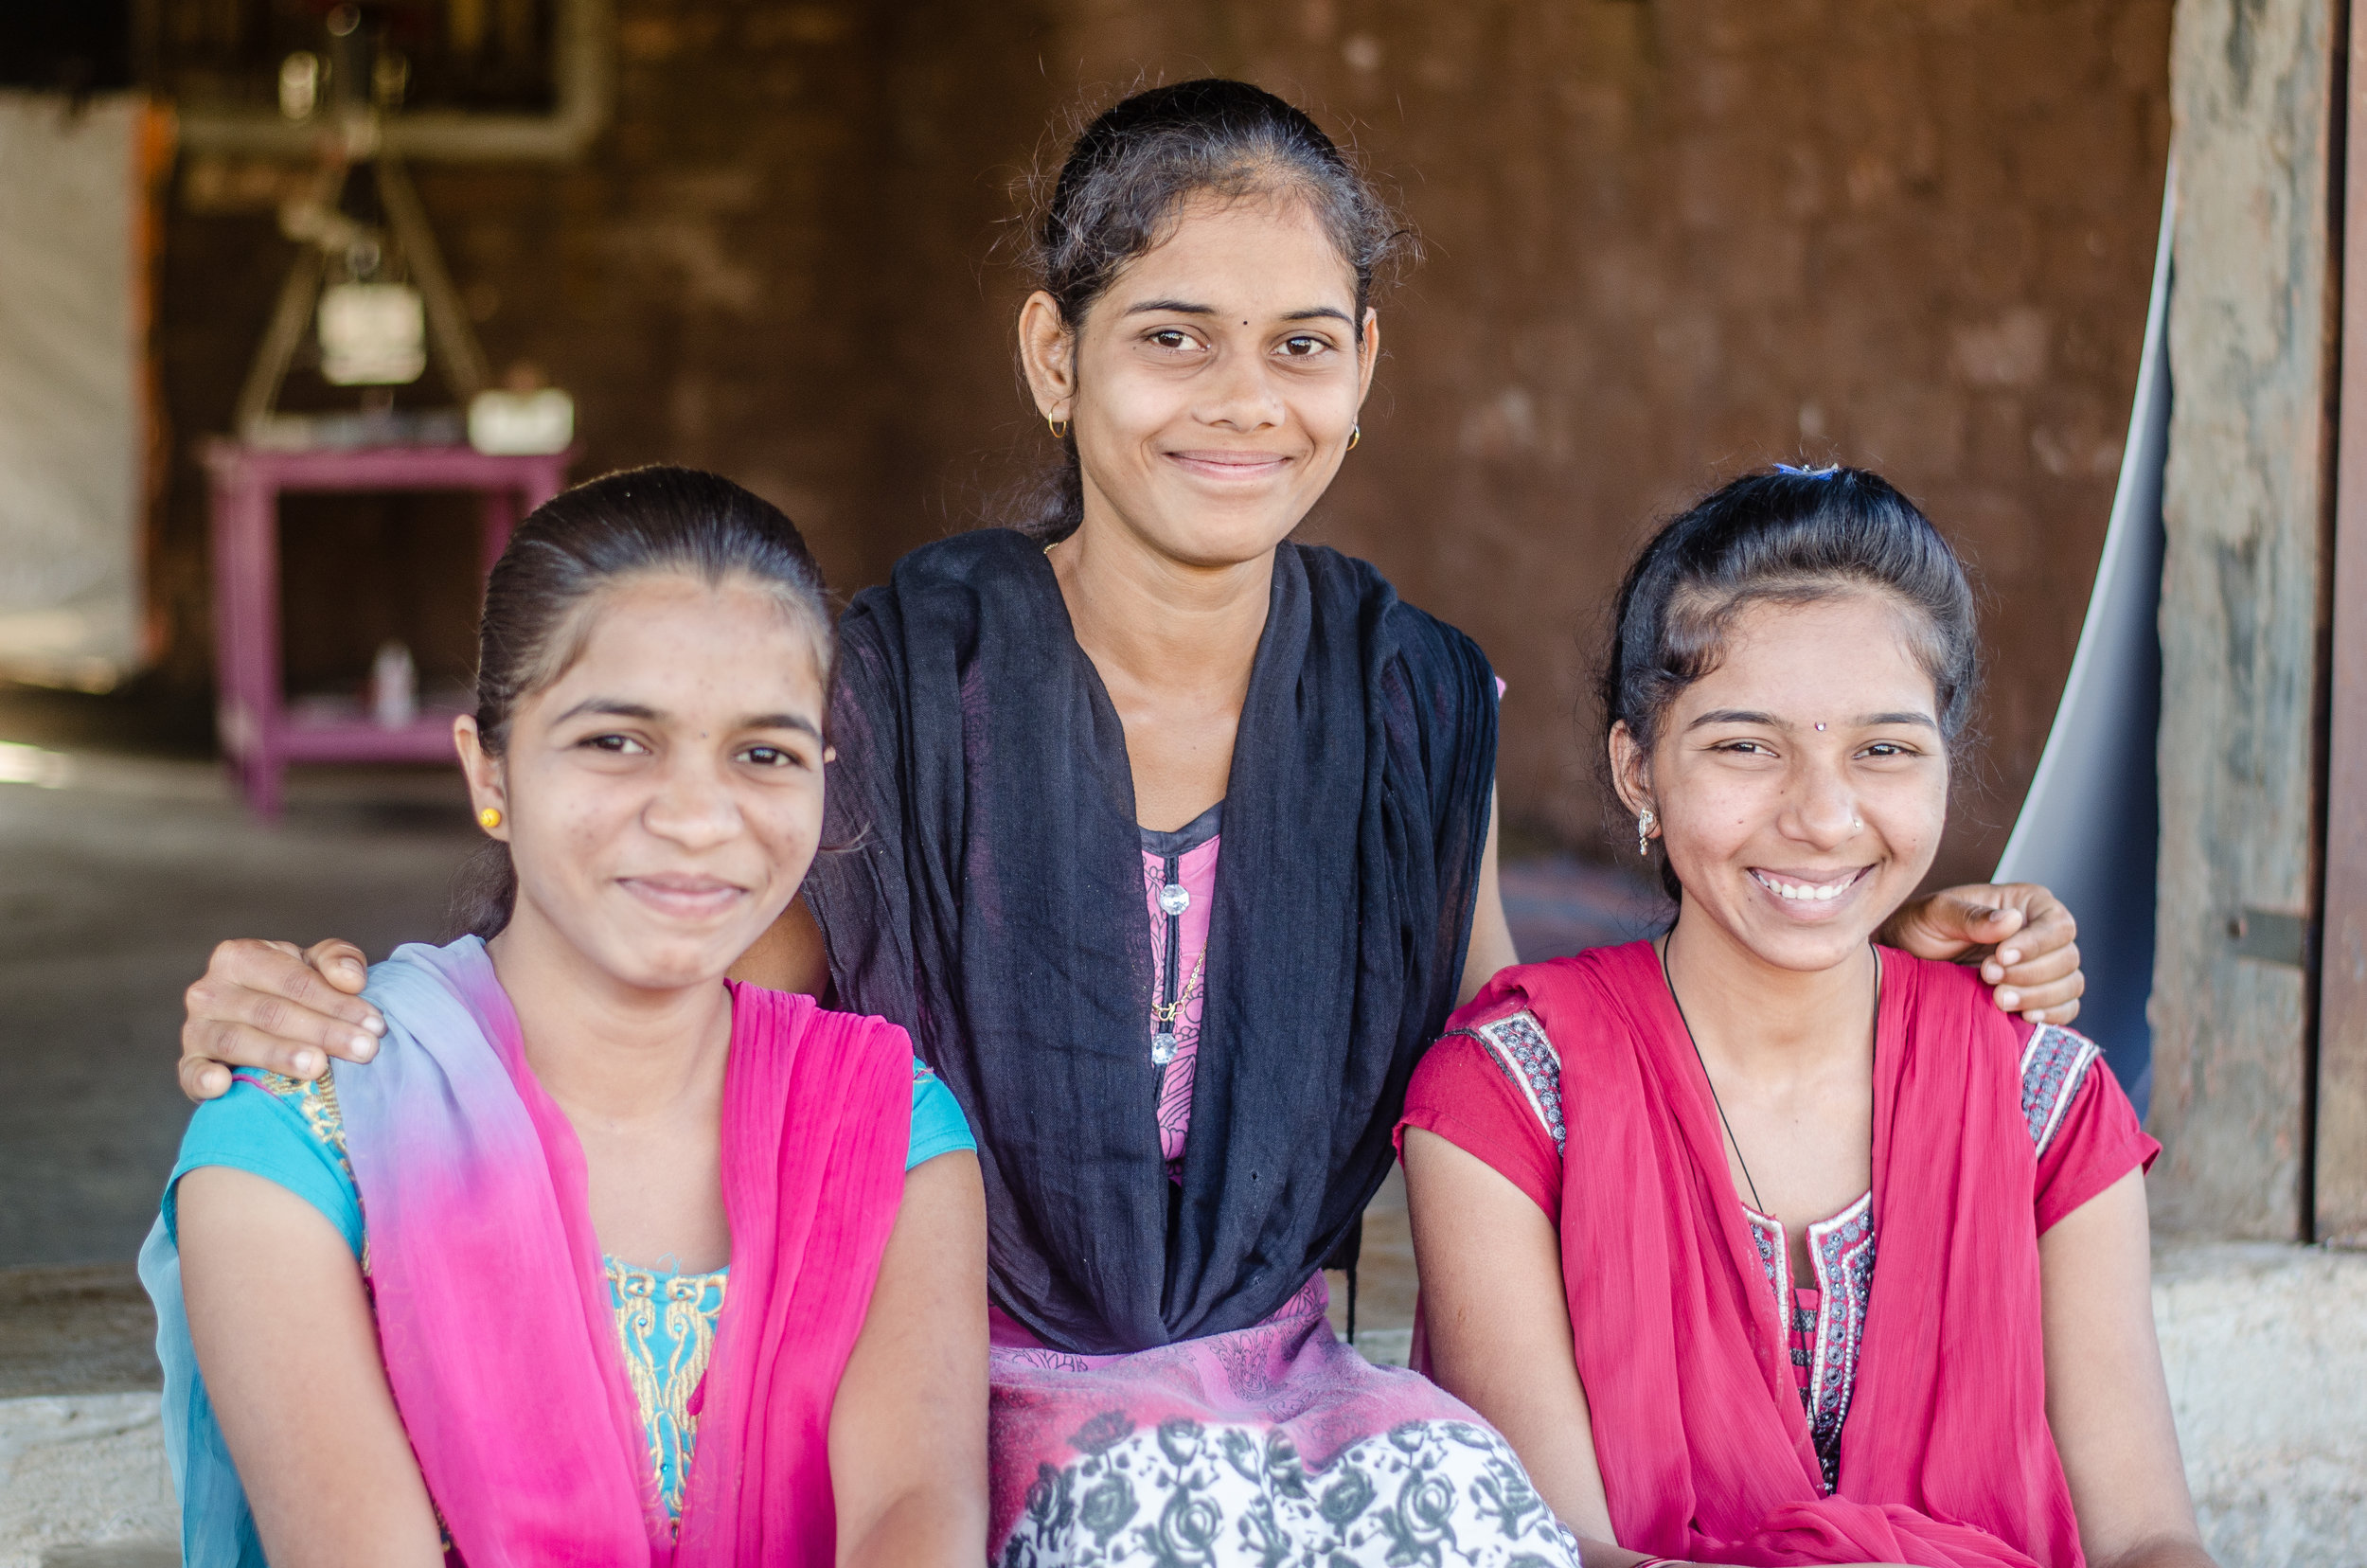 Left to right: Priyanka, Momta and Ranjana. Photo credit: Karan Khosla.